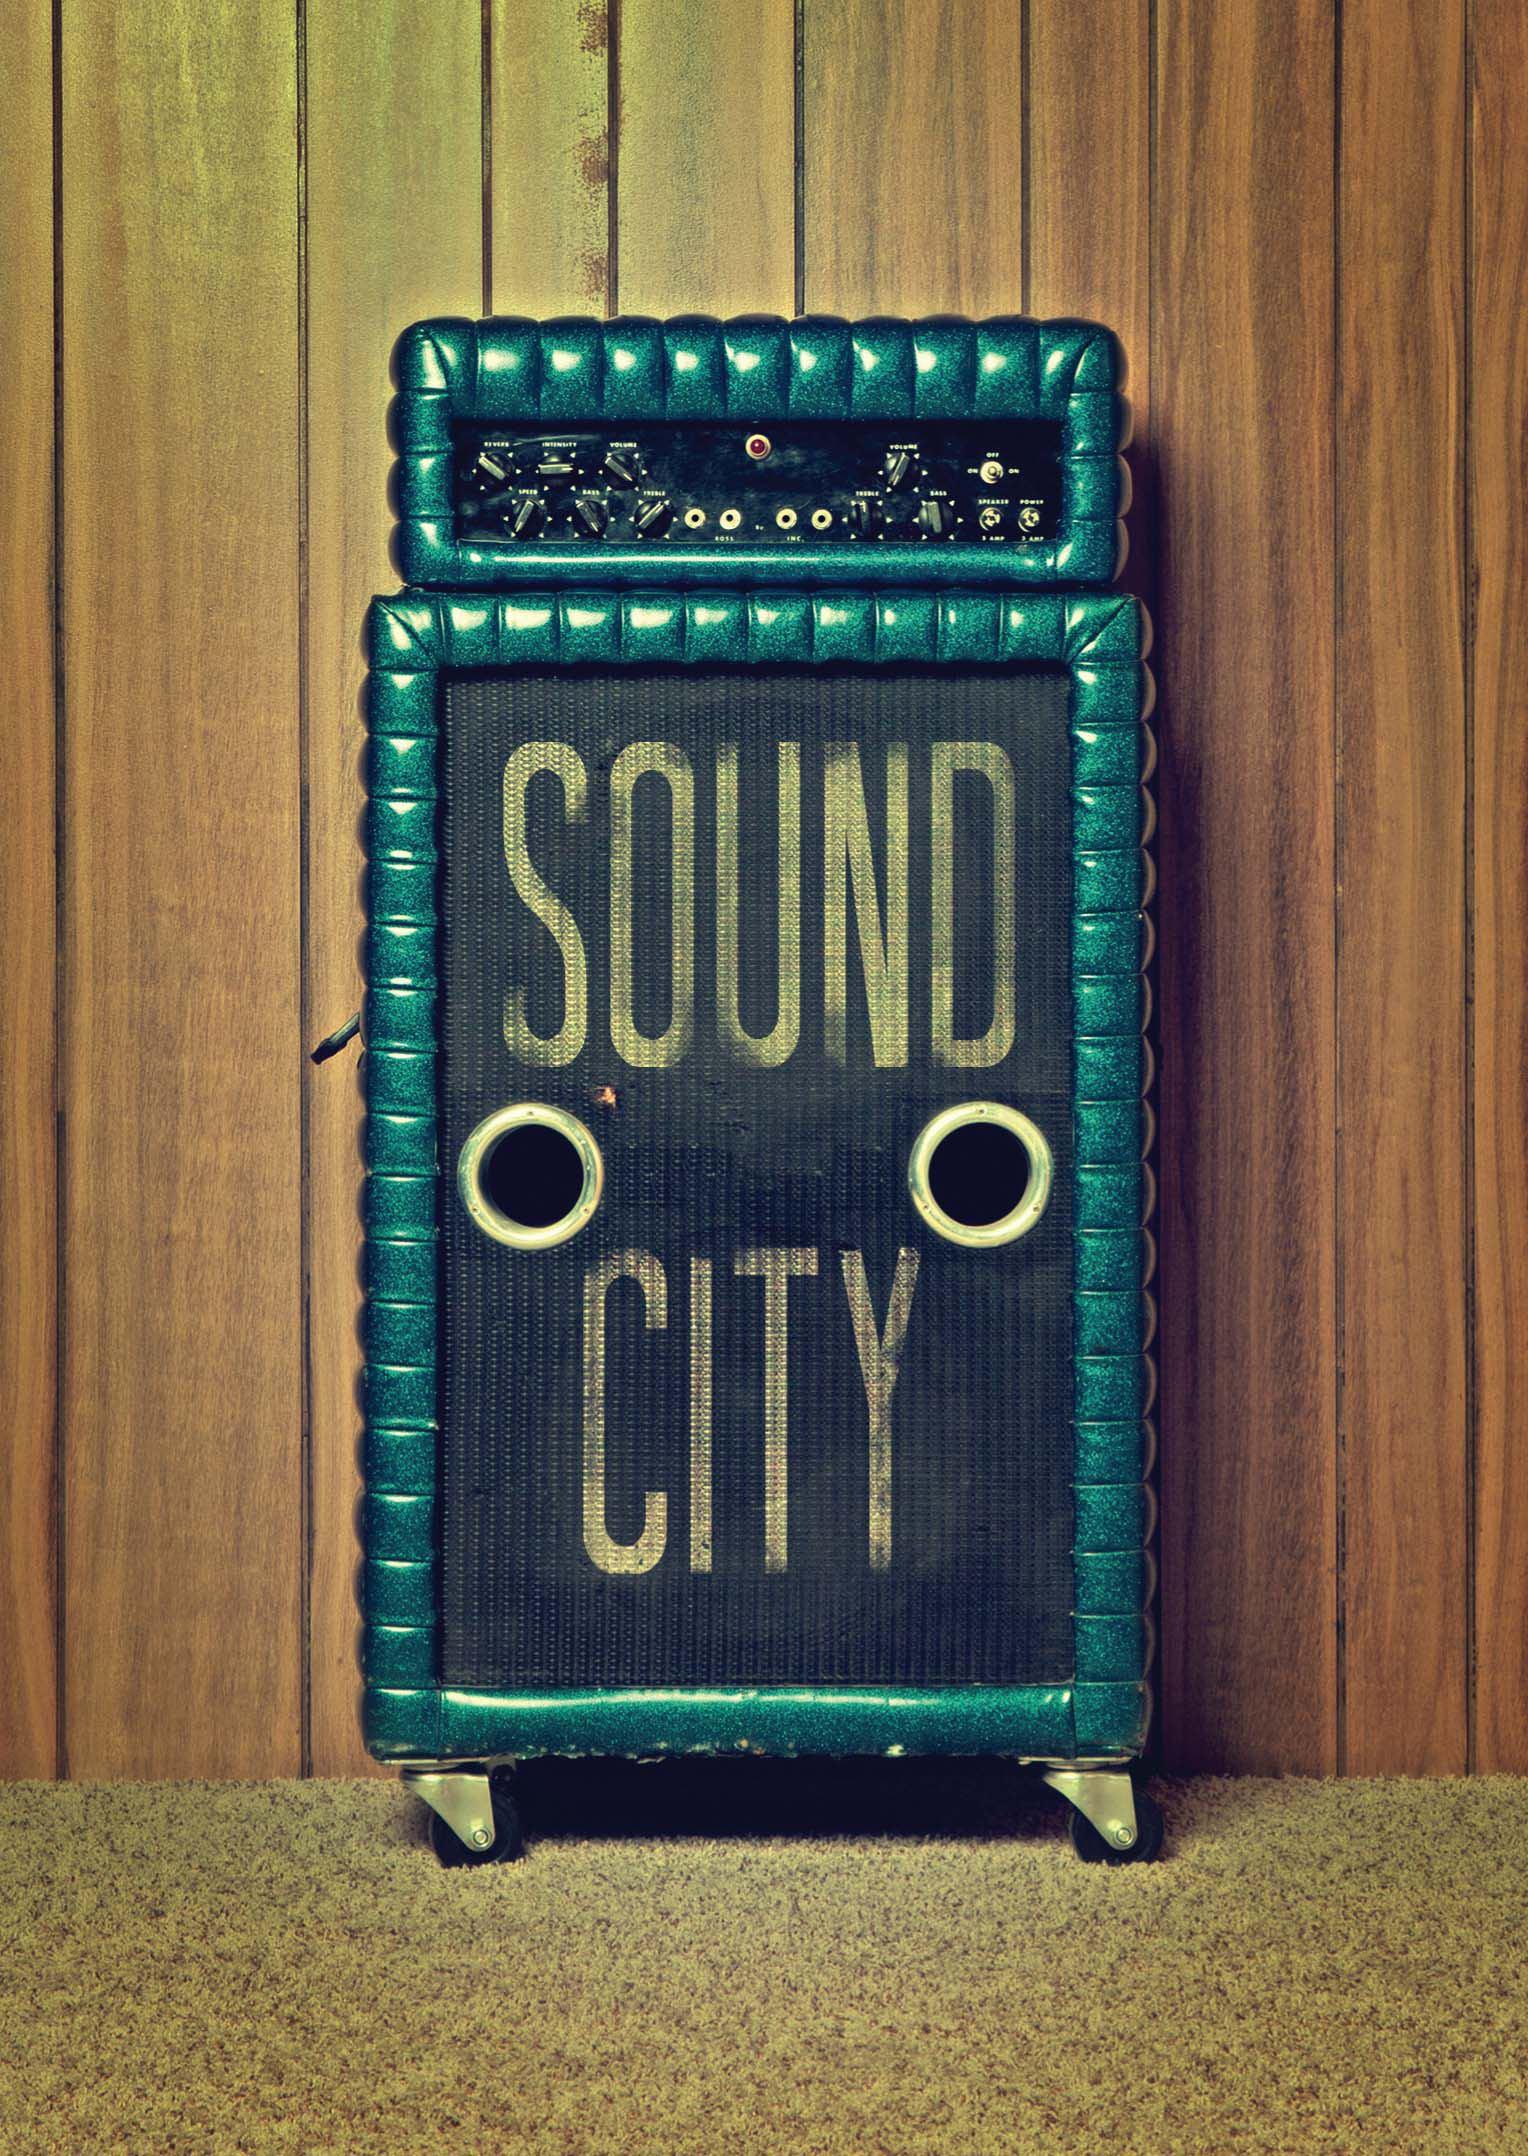 1_DVD_Sound_City